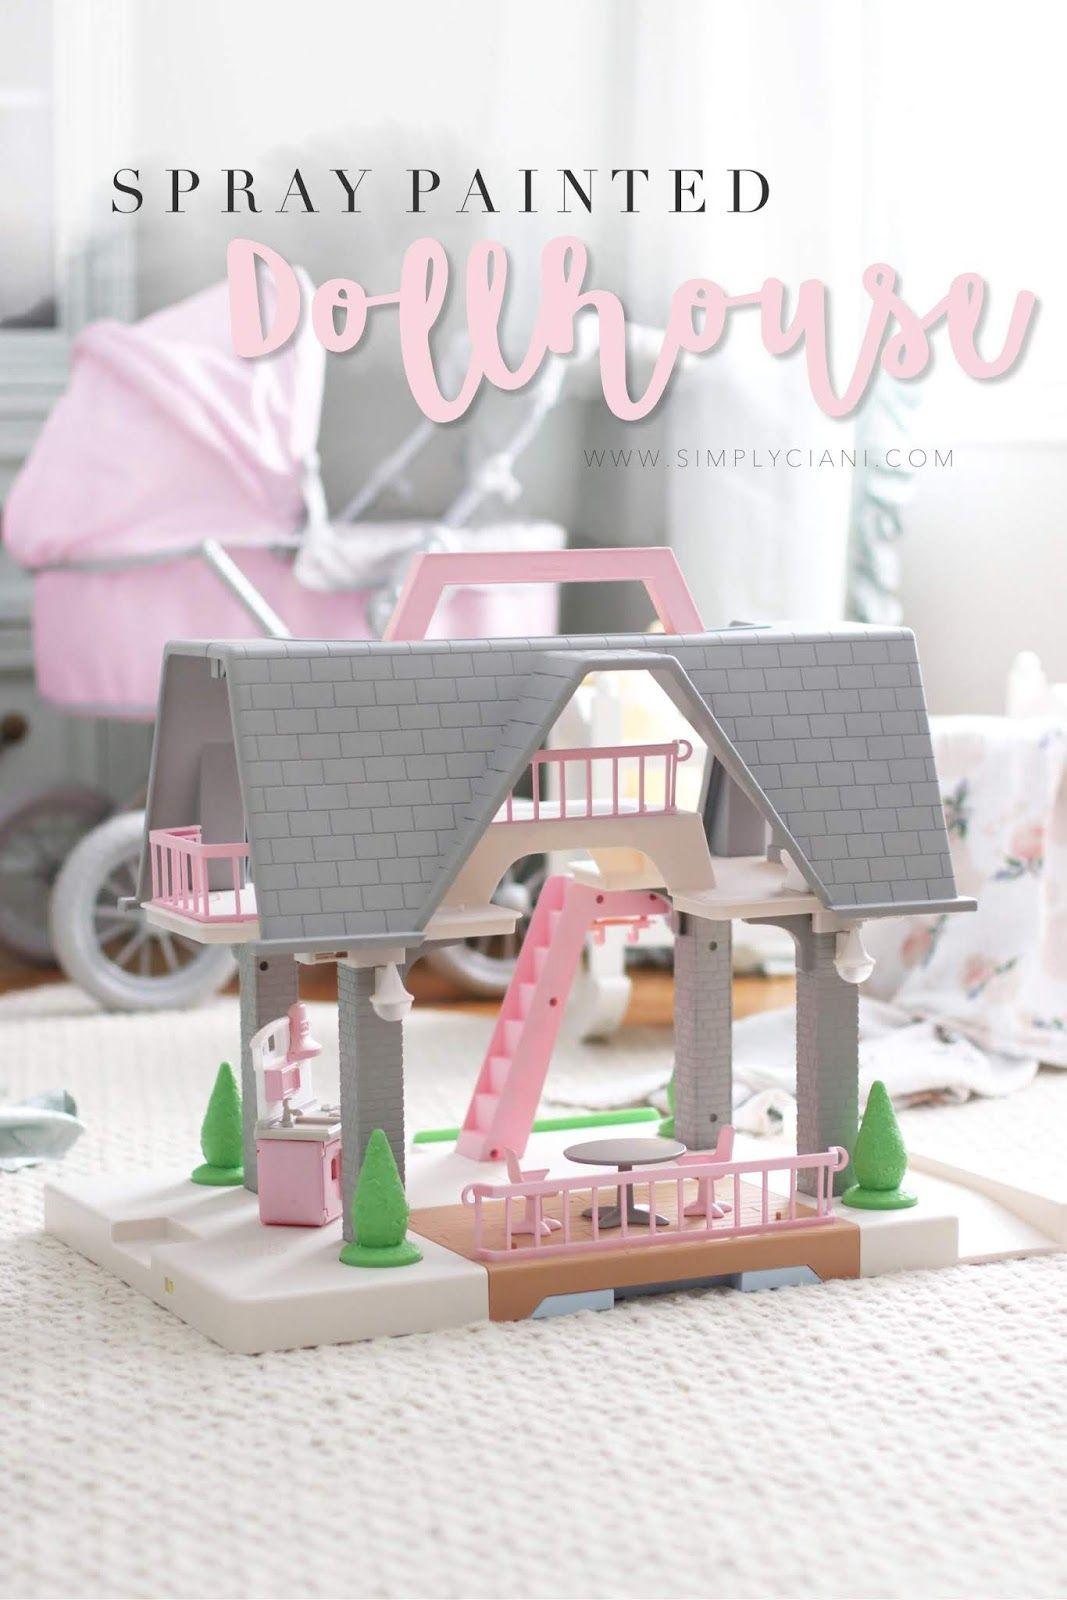 Spray Painted Dollhouse Transformation | Simply Ciani